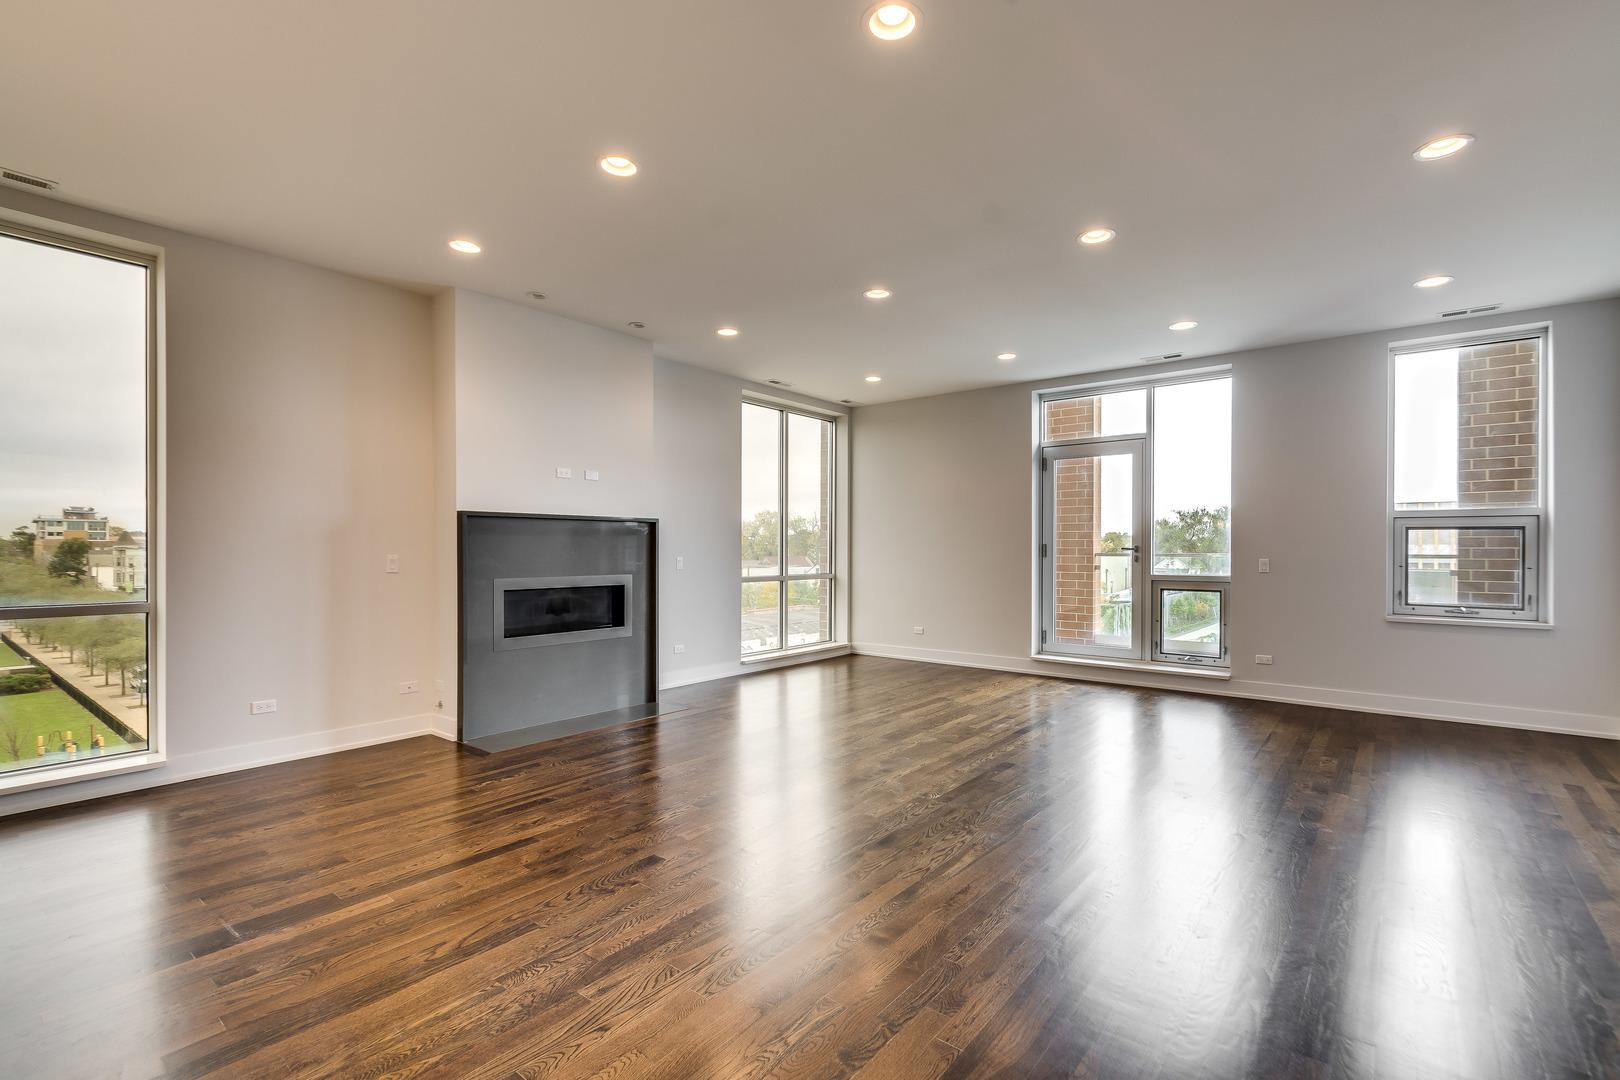 1803 N California Ave apartments for rent at AptAmigo